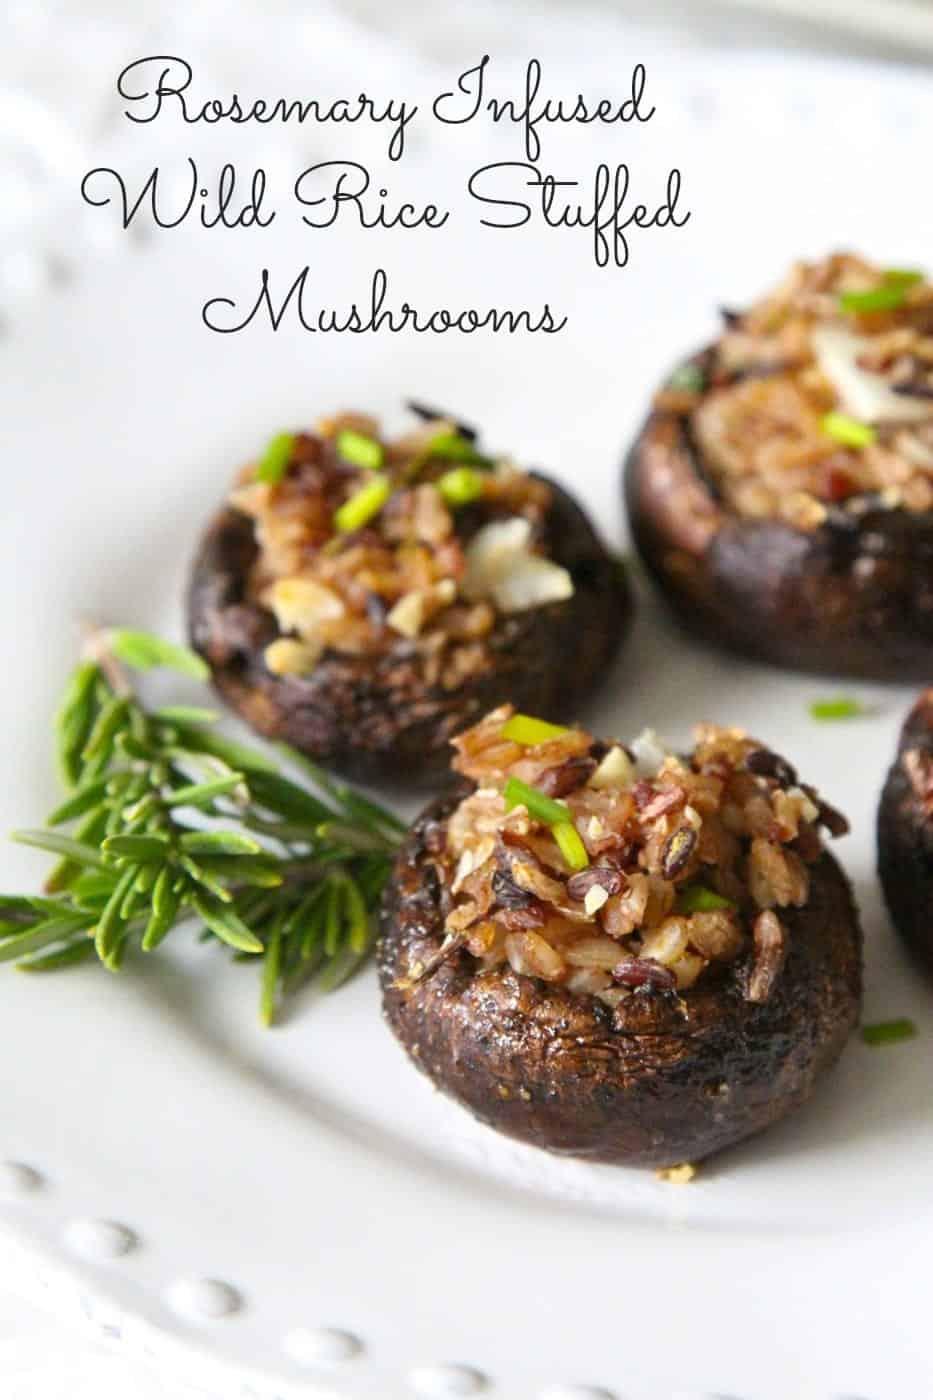 vegan stuffed mushrooms with wild rice